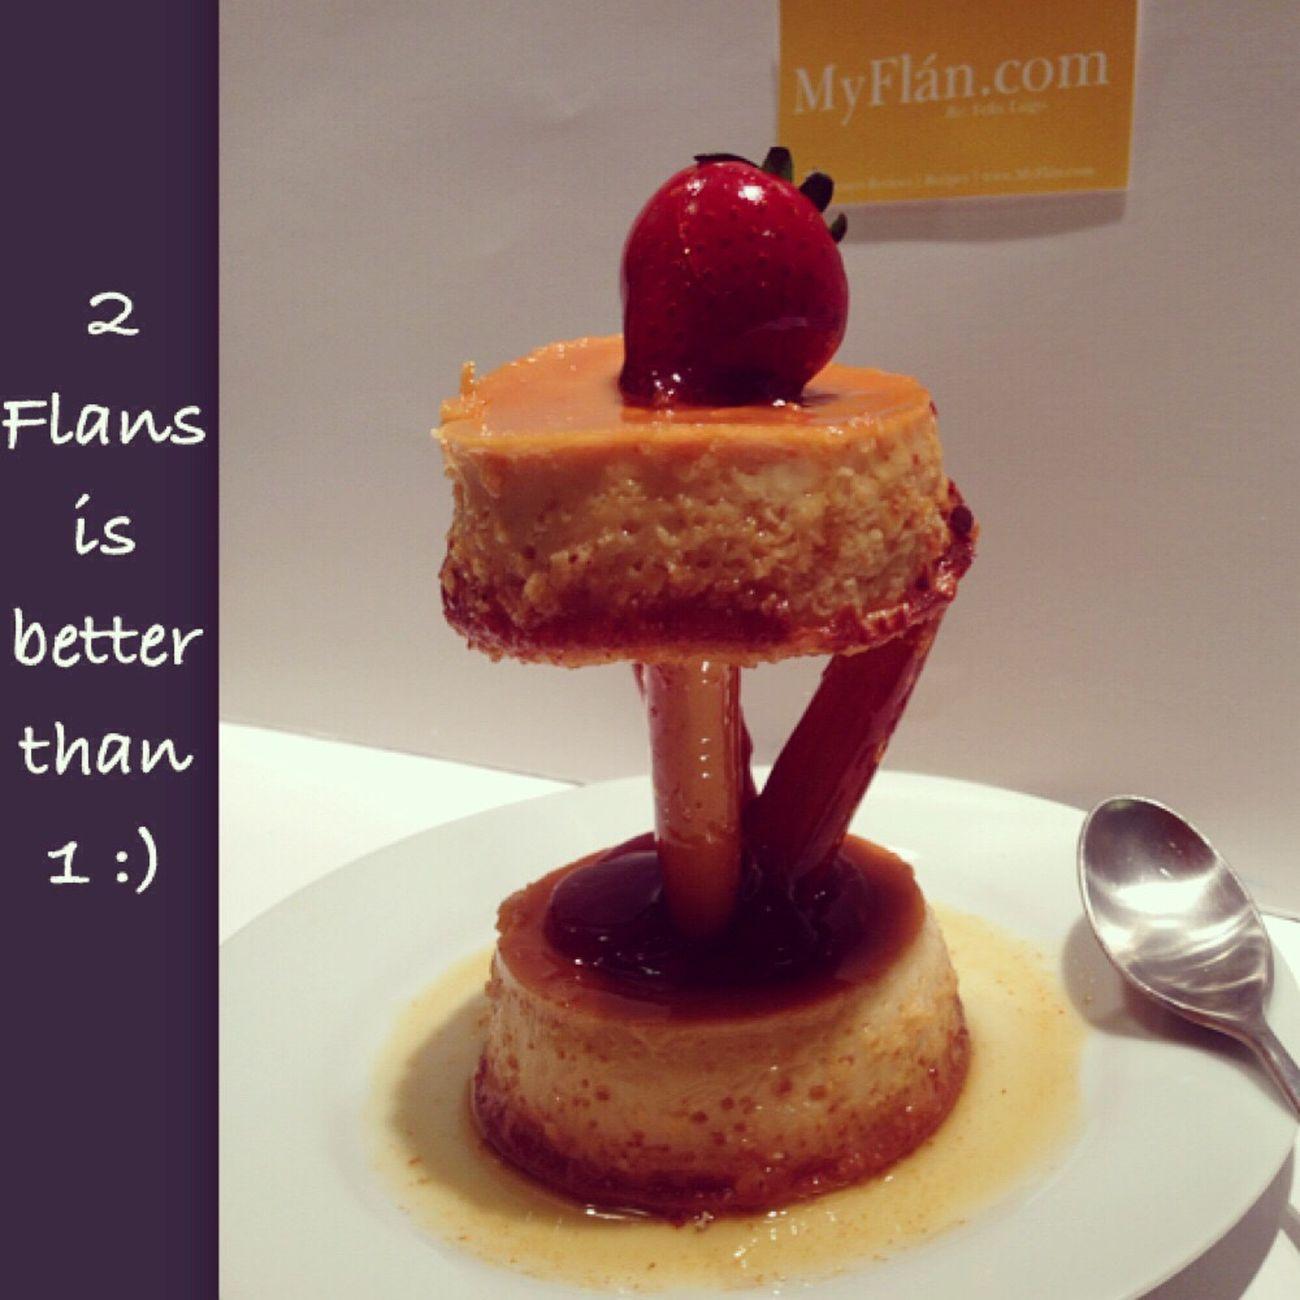 Pastry Flan Ratemyflan Recipe Myflan Foodporn Baked Goods Food Sugar Foodie